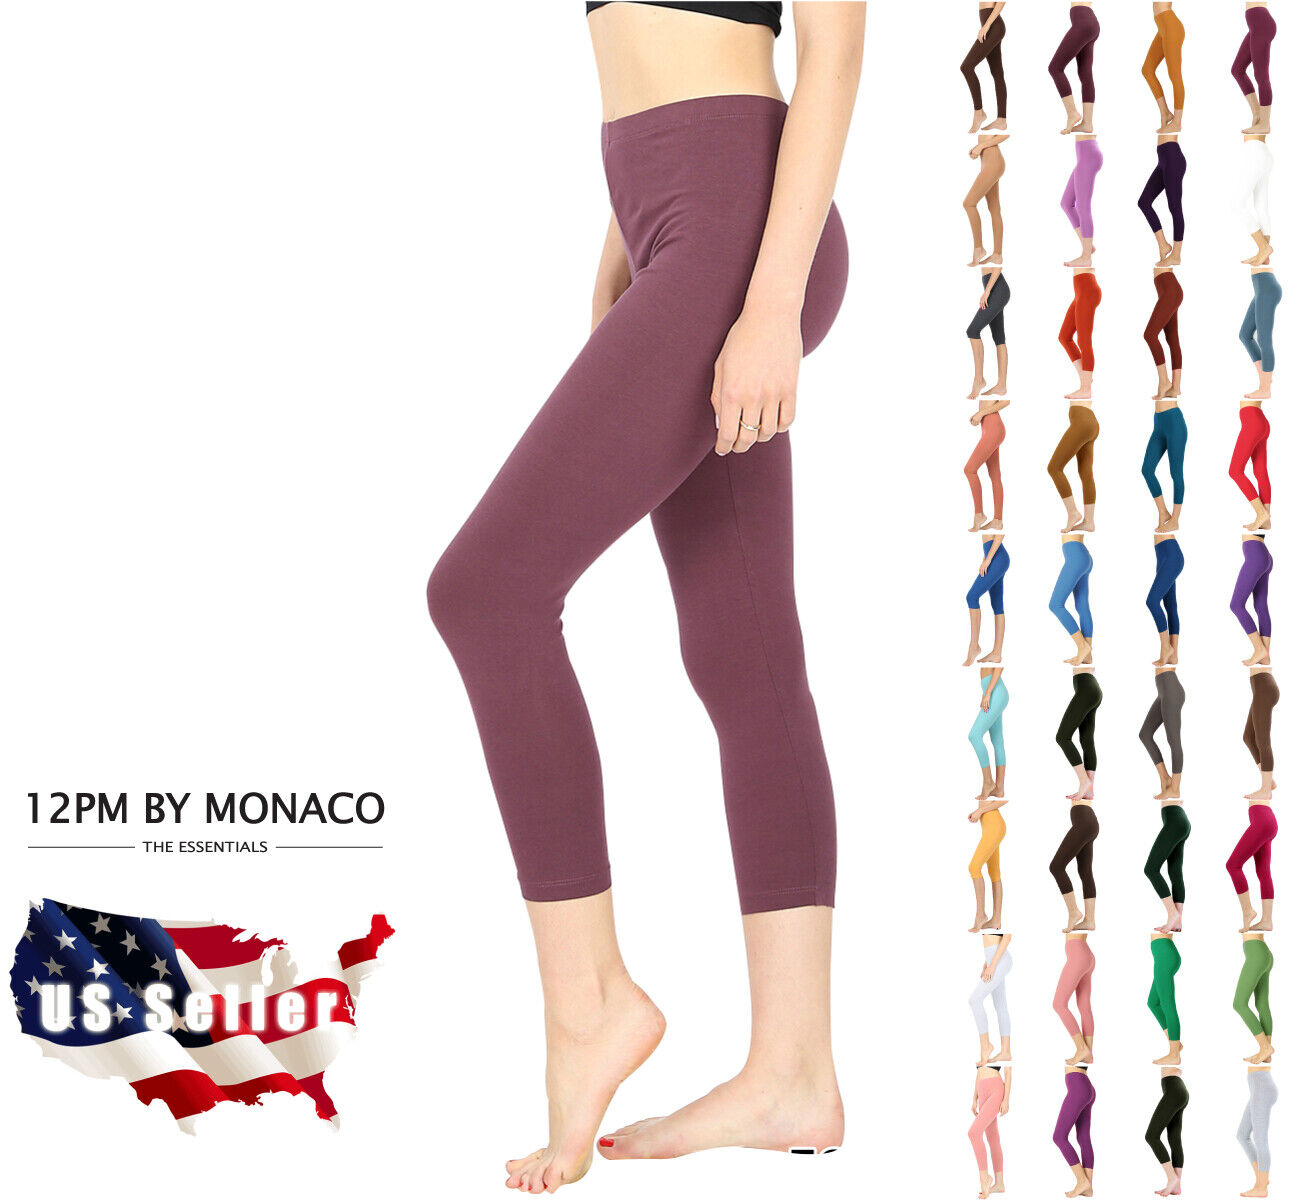 Zenana Capri Leggings Cropped Crop 3/4 Basic Cotton Stretch Pants High Rise Clothing, Shoes & Accessories